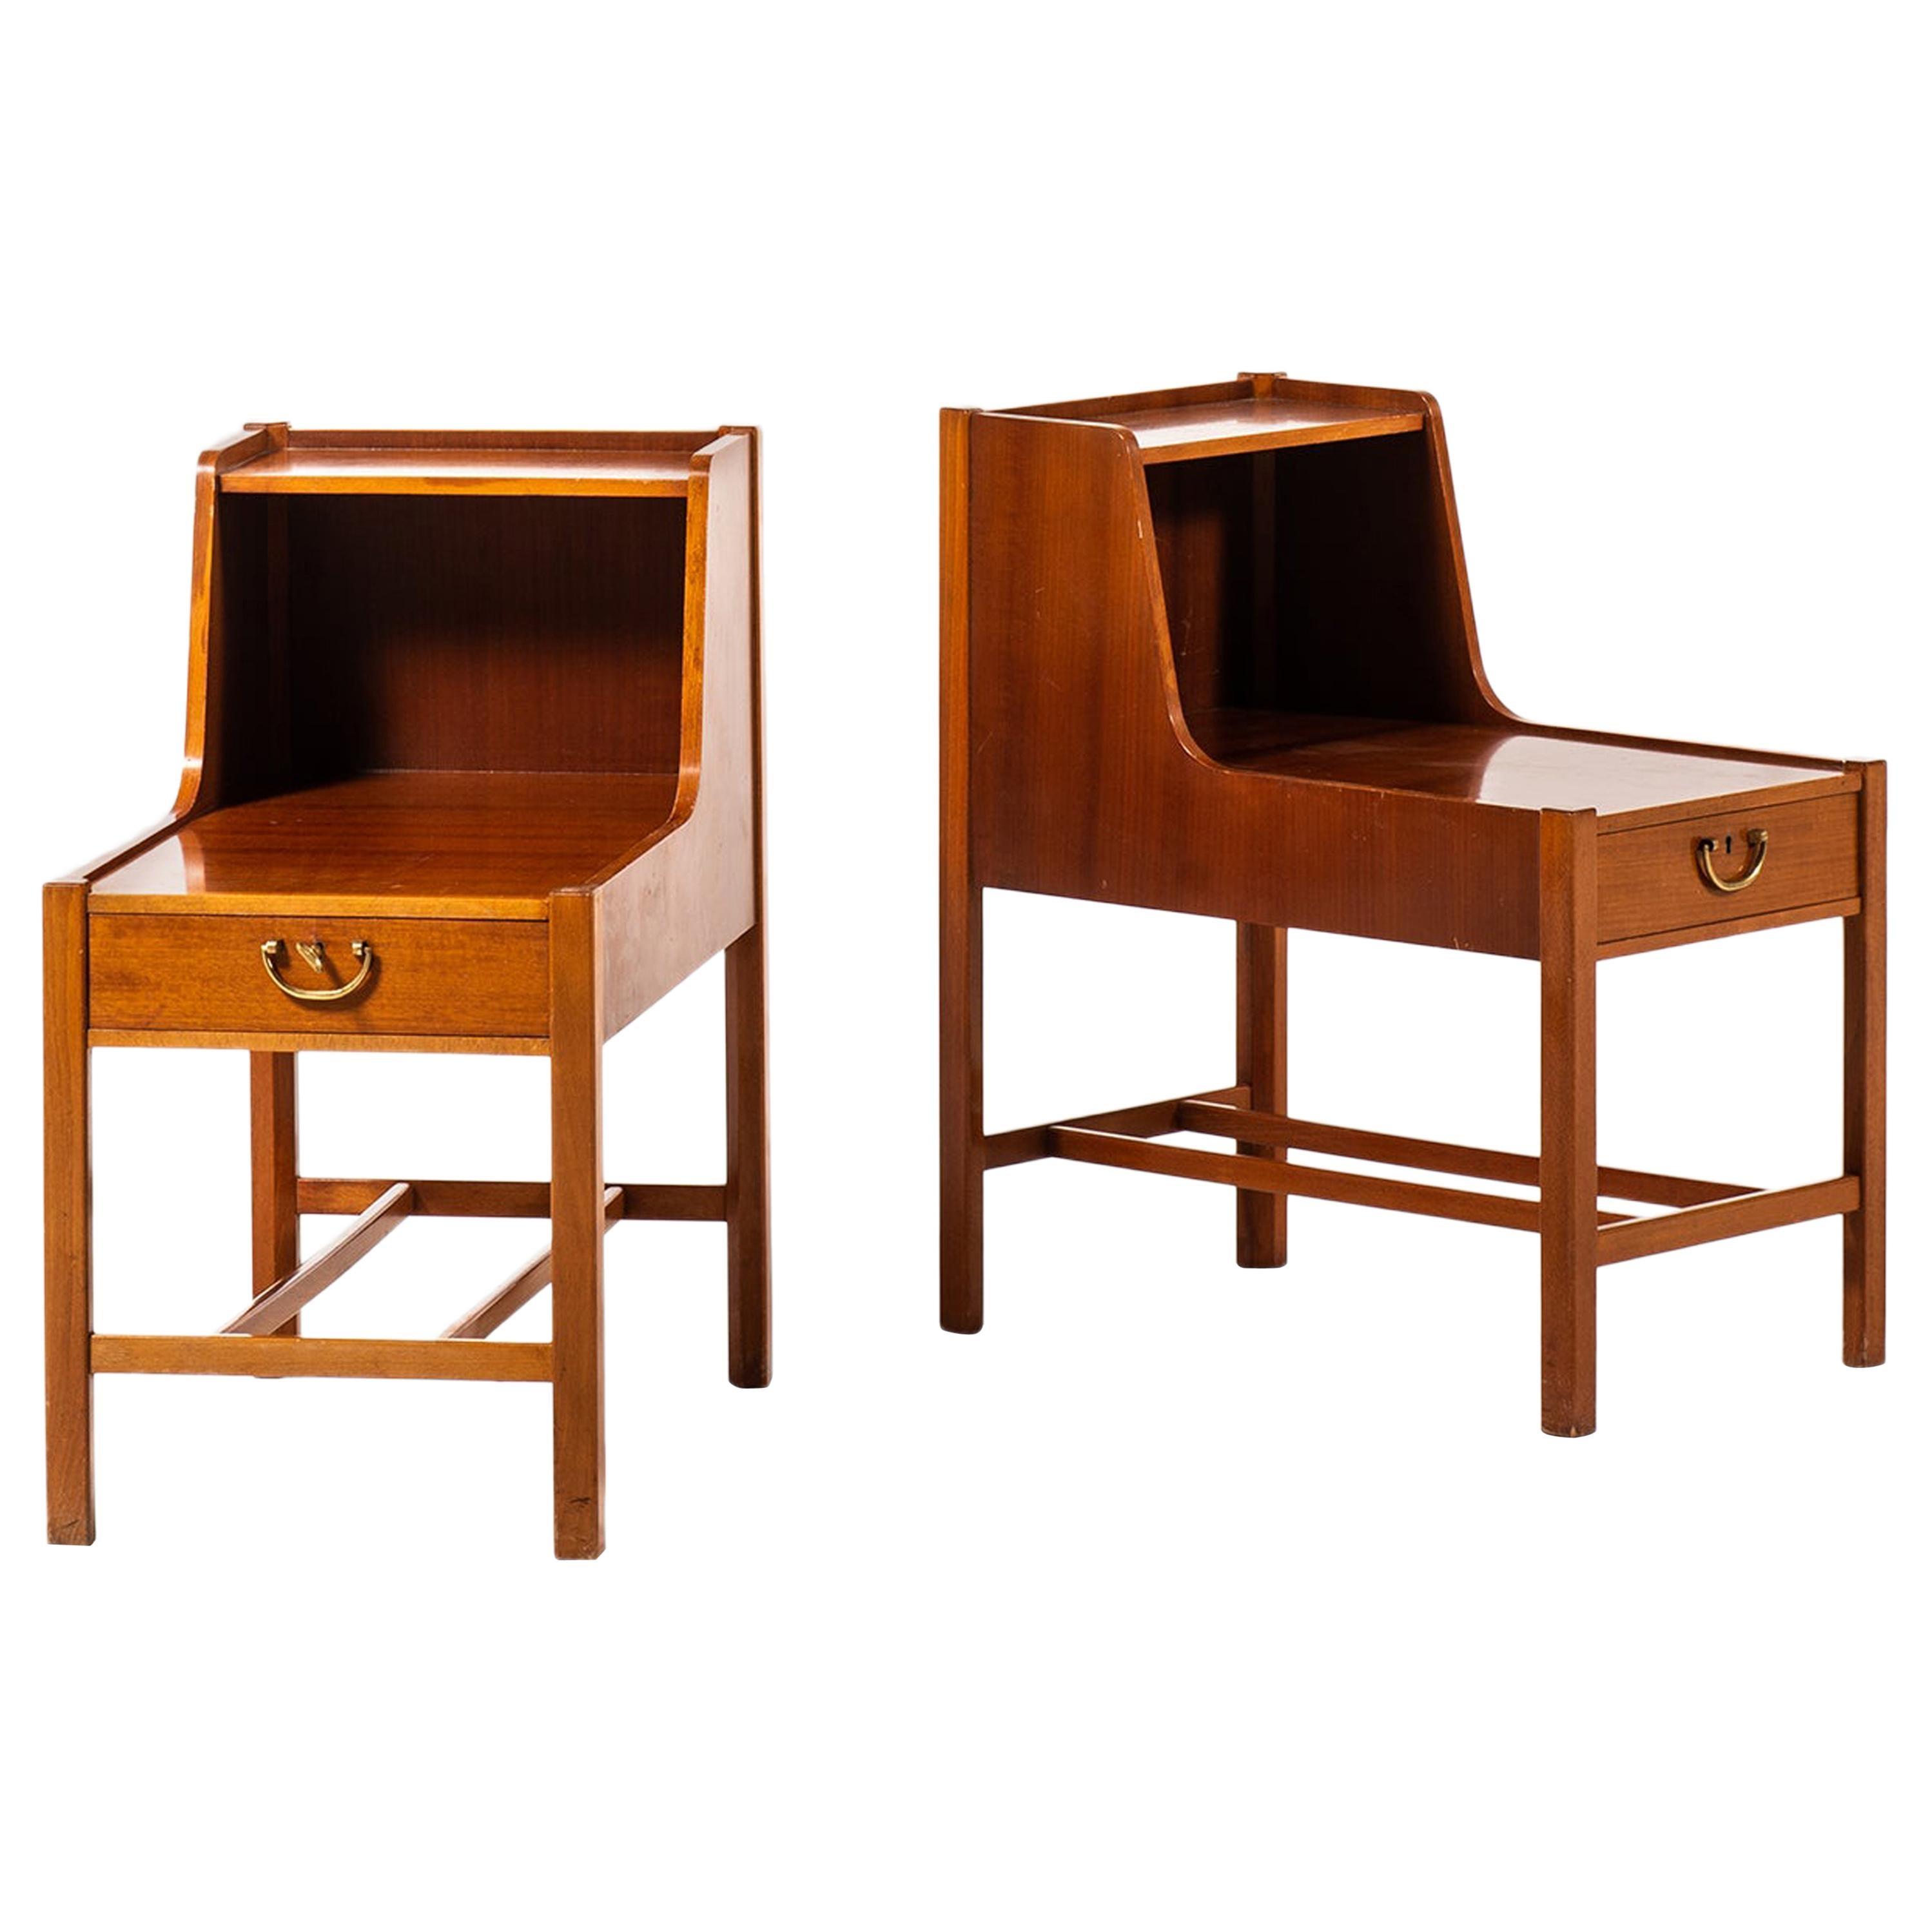 David Rosén Side / Bedside Tables by Nordiska Kompaniet in Sweden